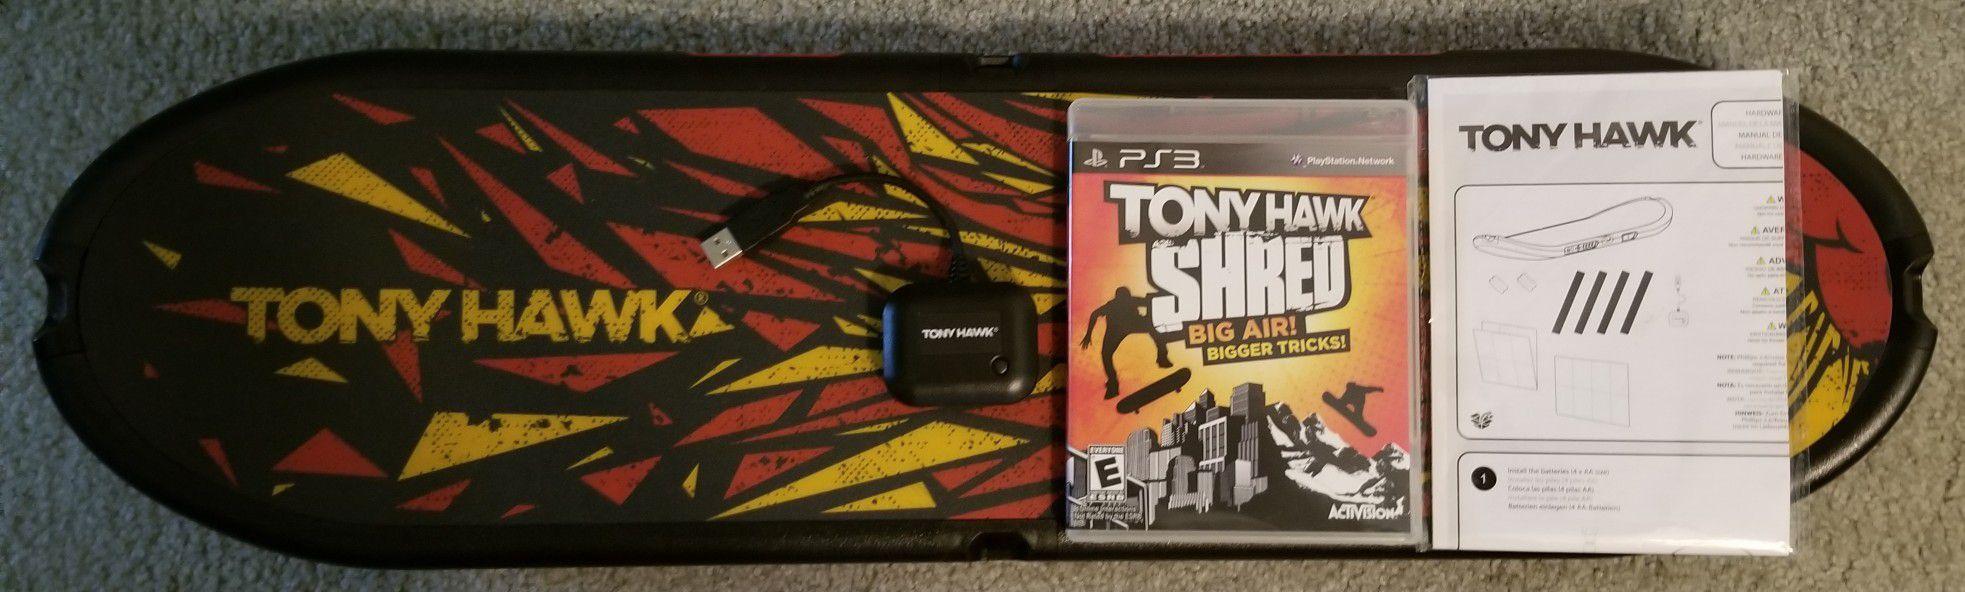 PS3 game Tony Hawk Shred